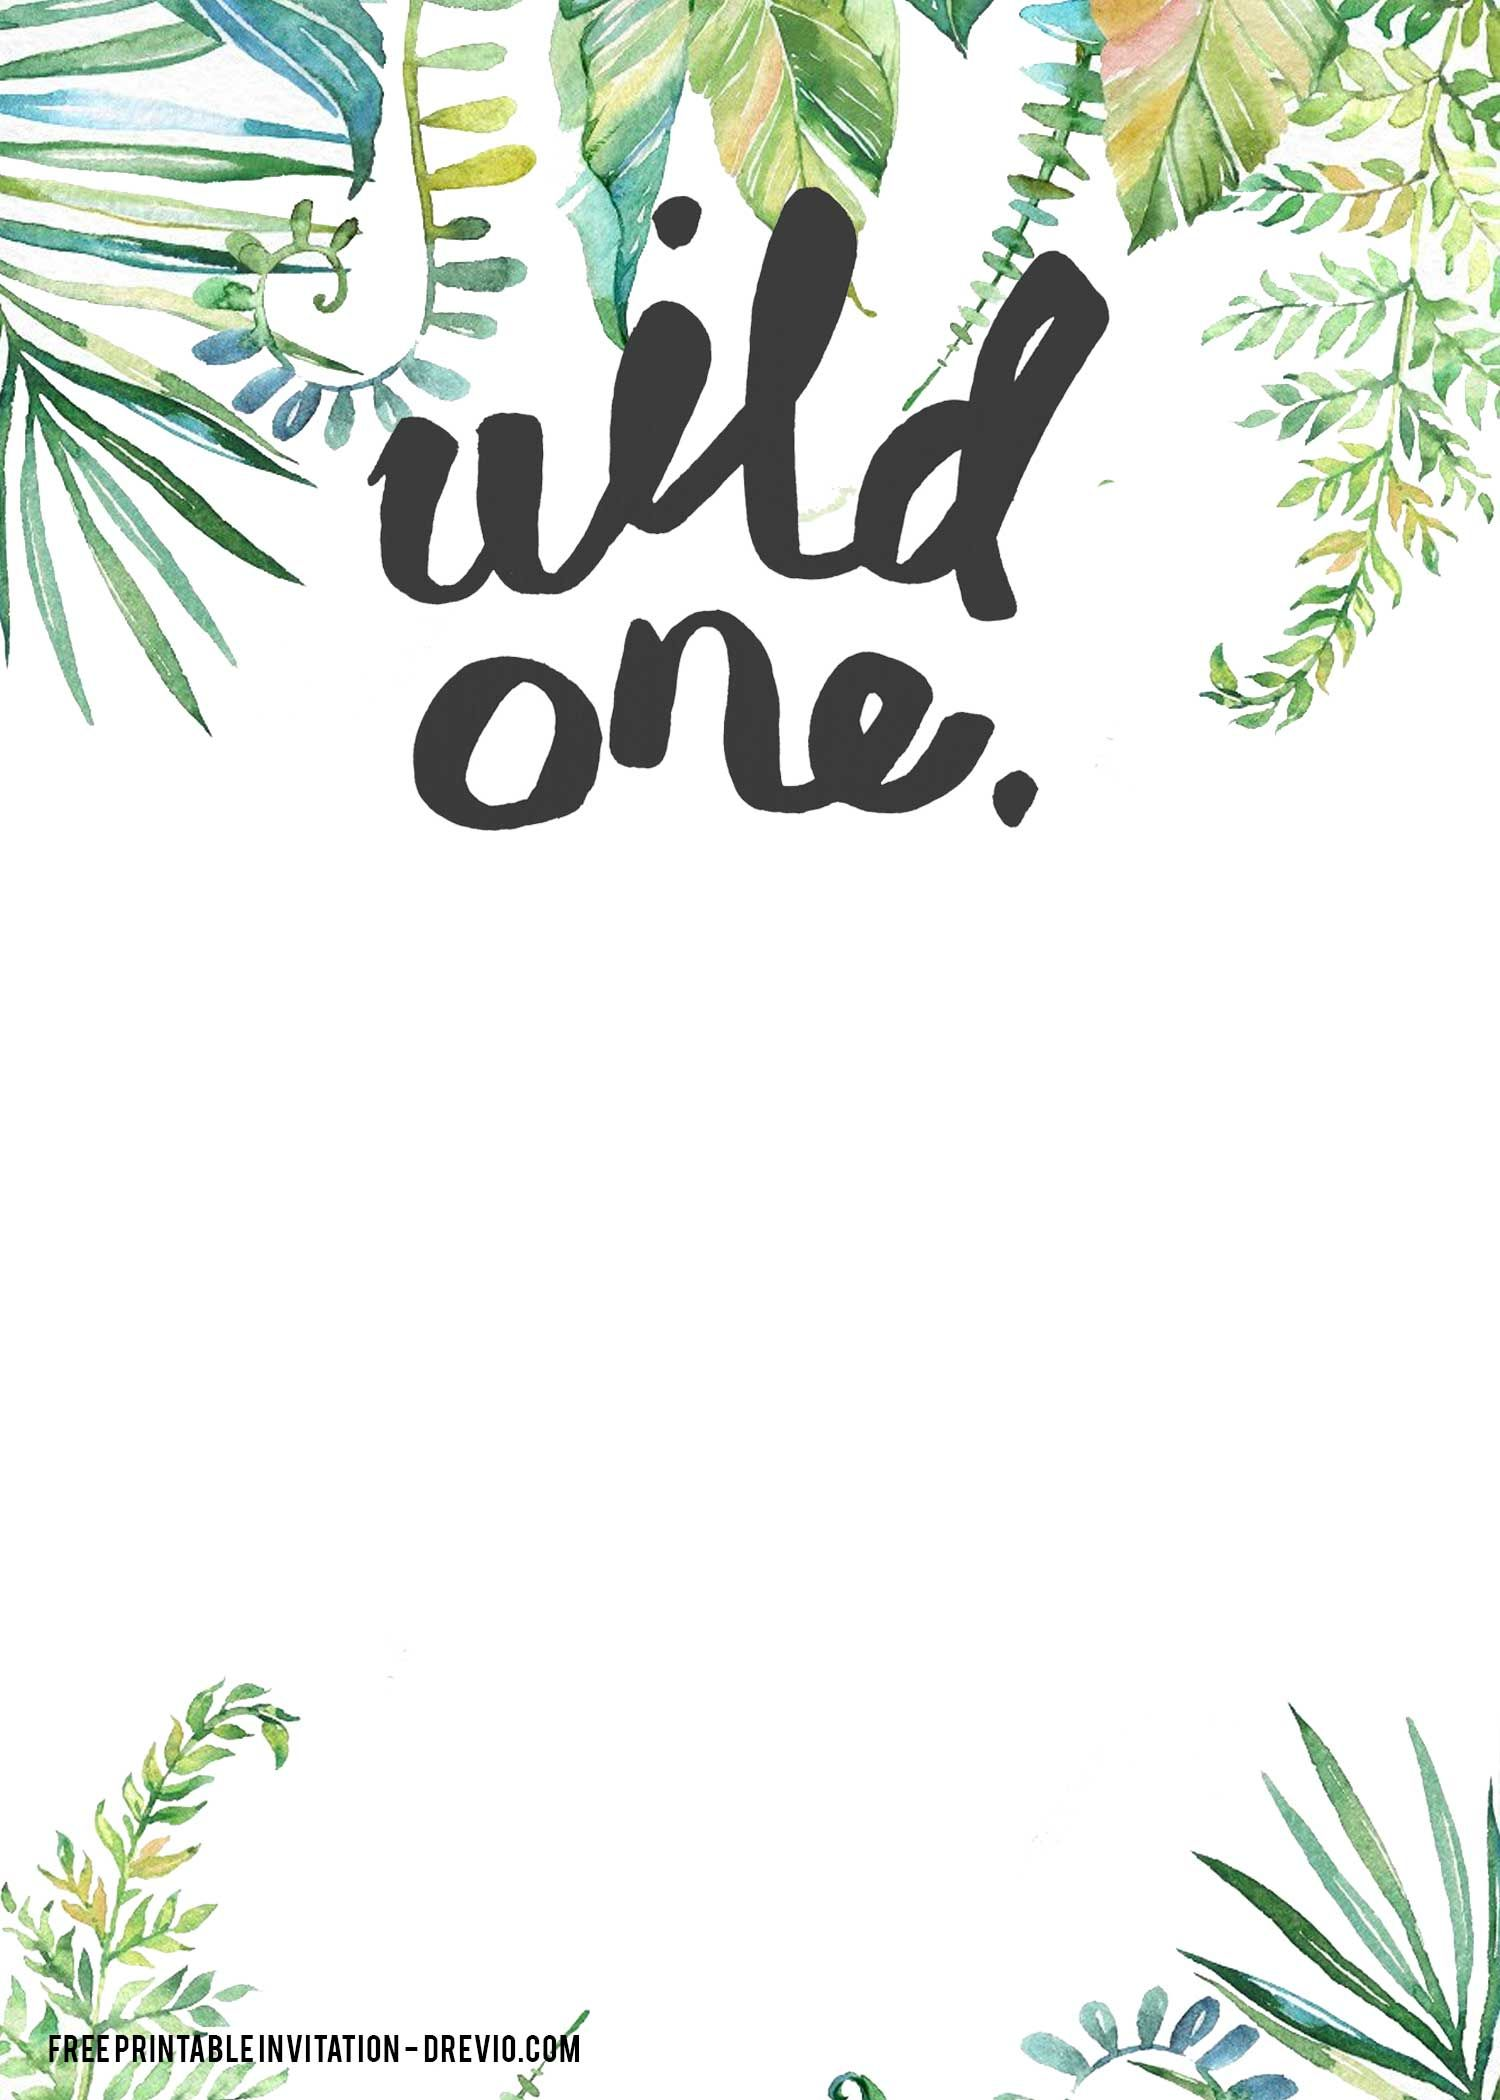 Free Printable Wild One Invitation Templates Free Invitation Templates Free Invitation Templates Jungle Birthday Invitations Free Invitations